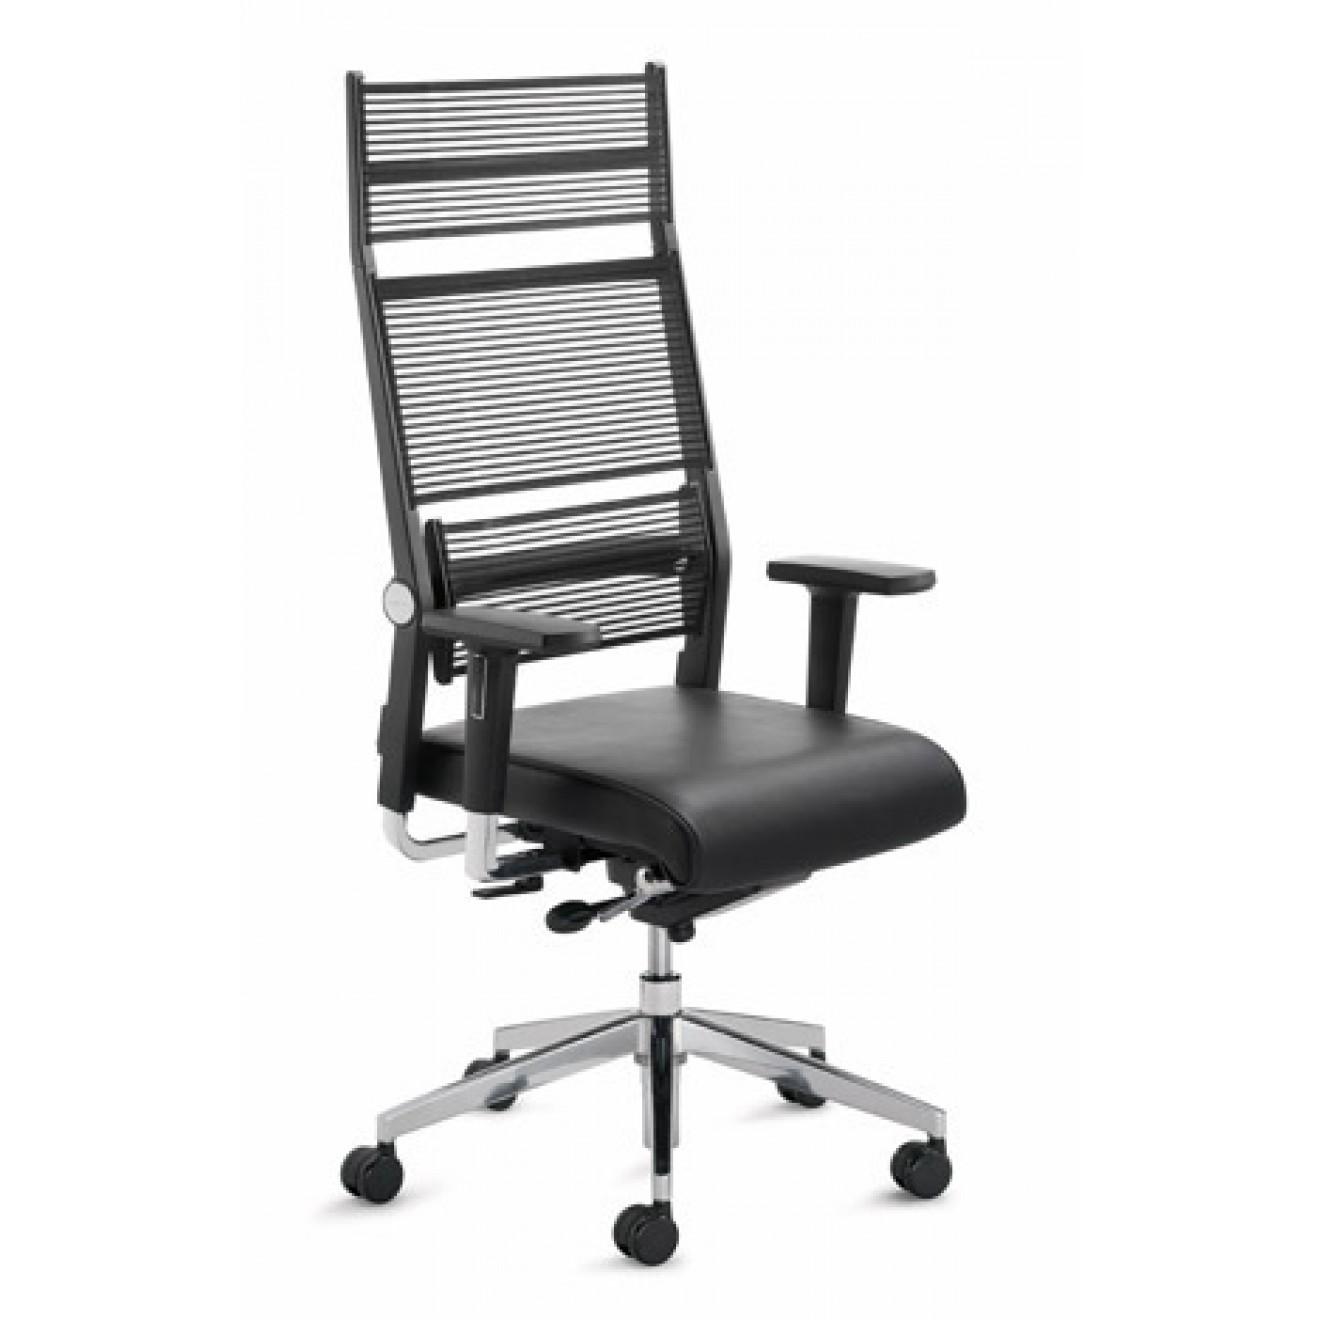 dauphin lordo advanced lo 33905 lo 33925. Black Bedroom Furniture Sets. Home Design Ideas